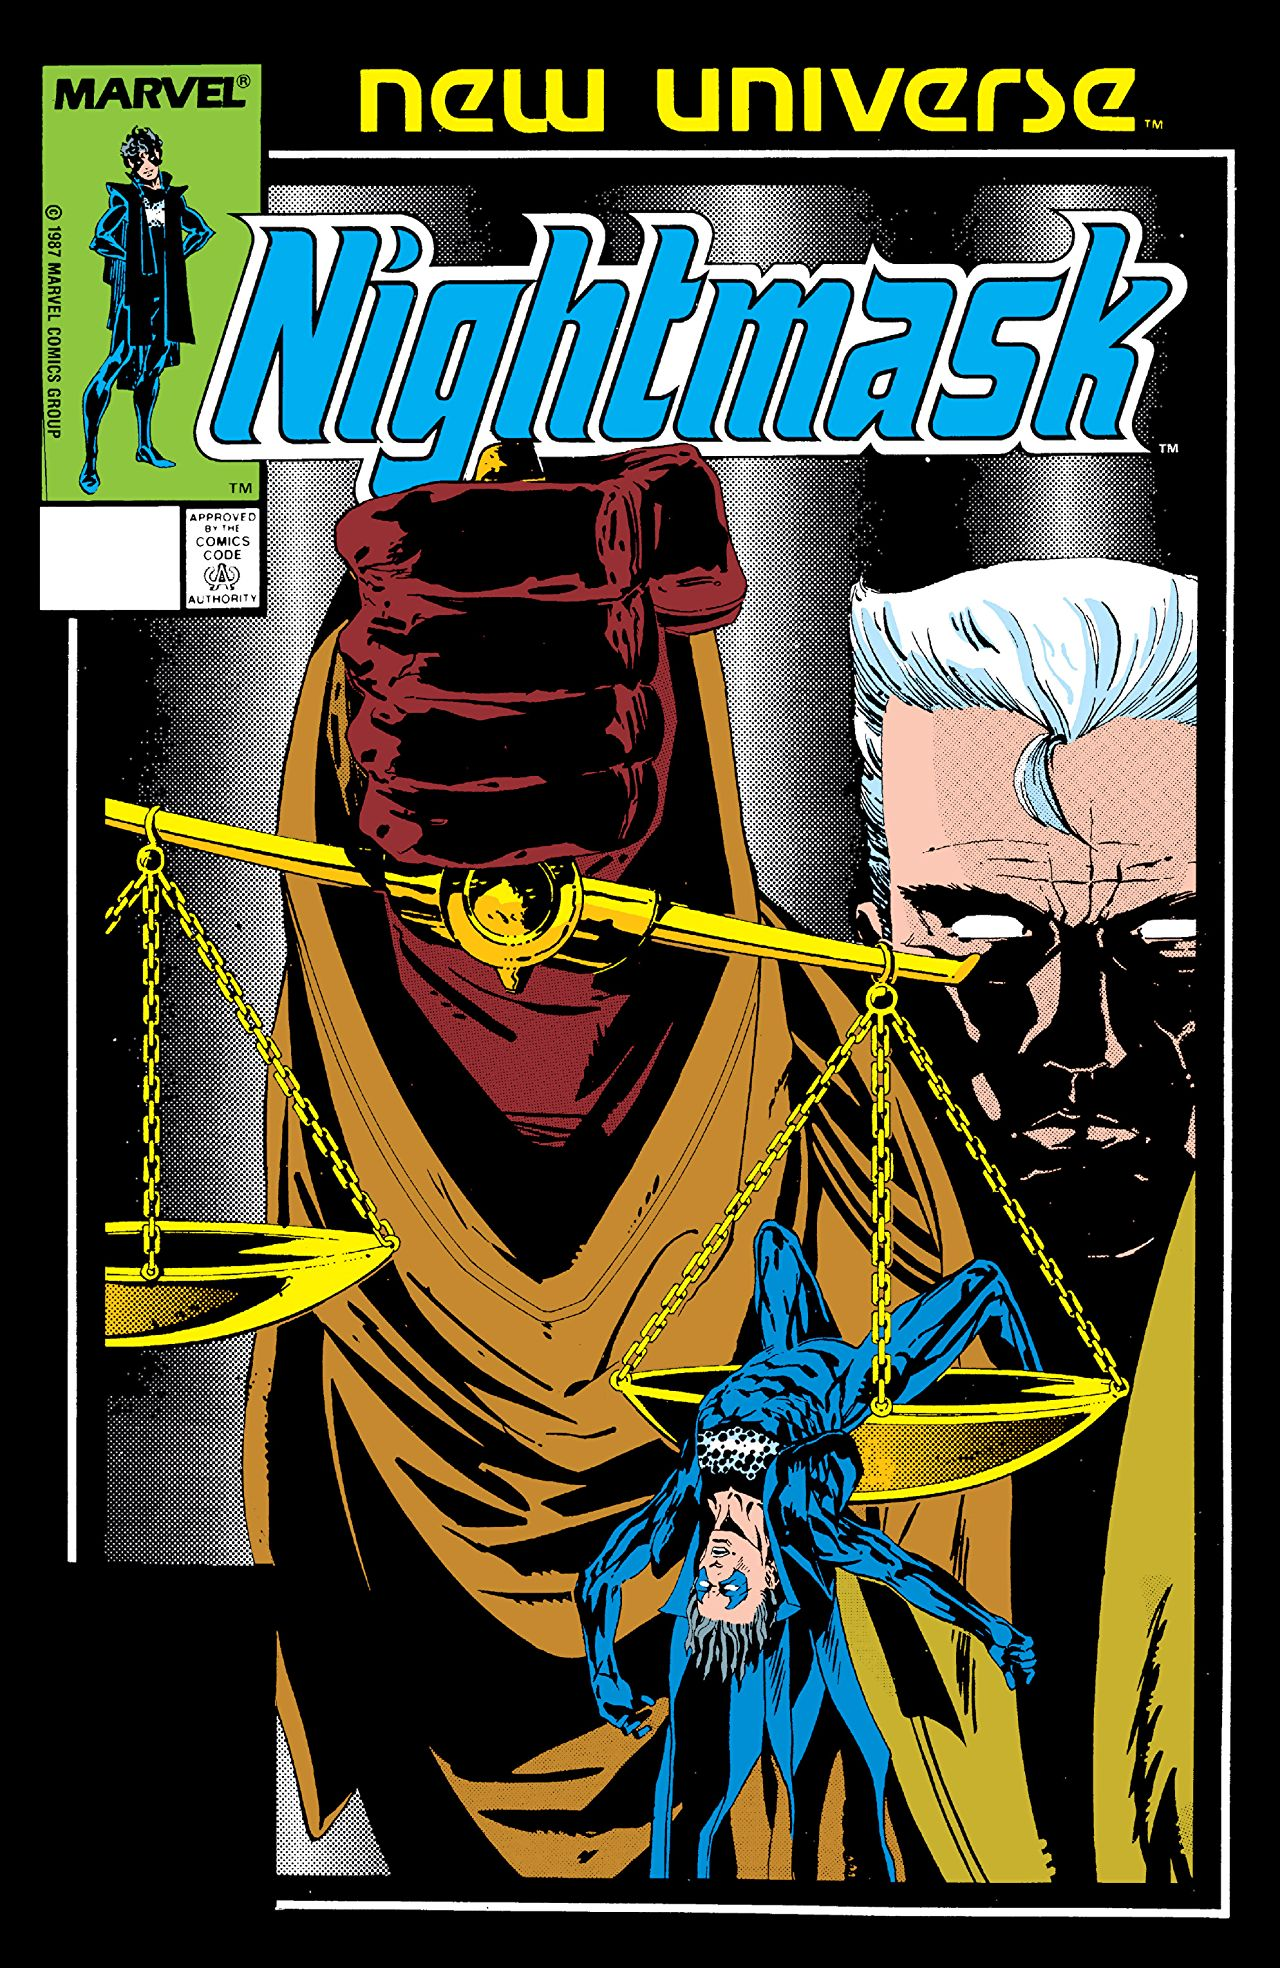 Nightmask Vol 1 8